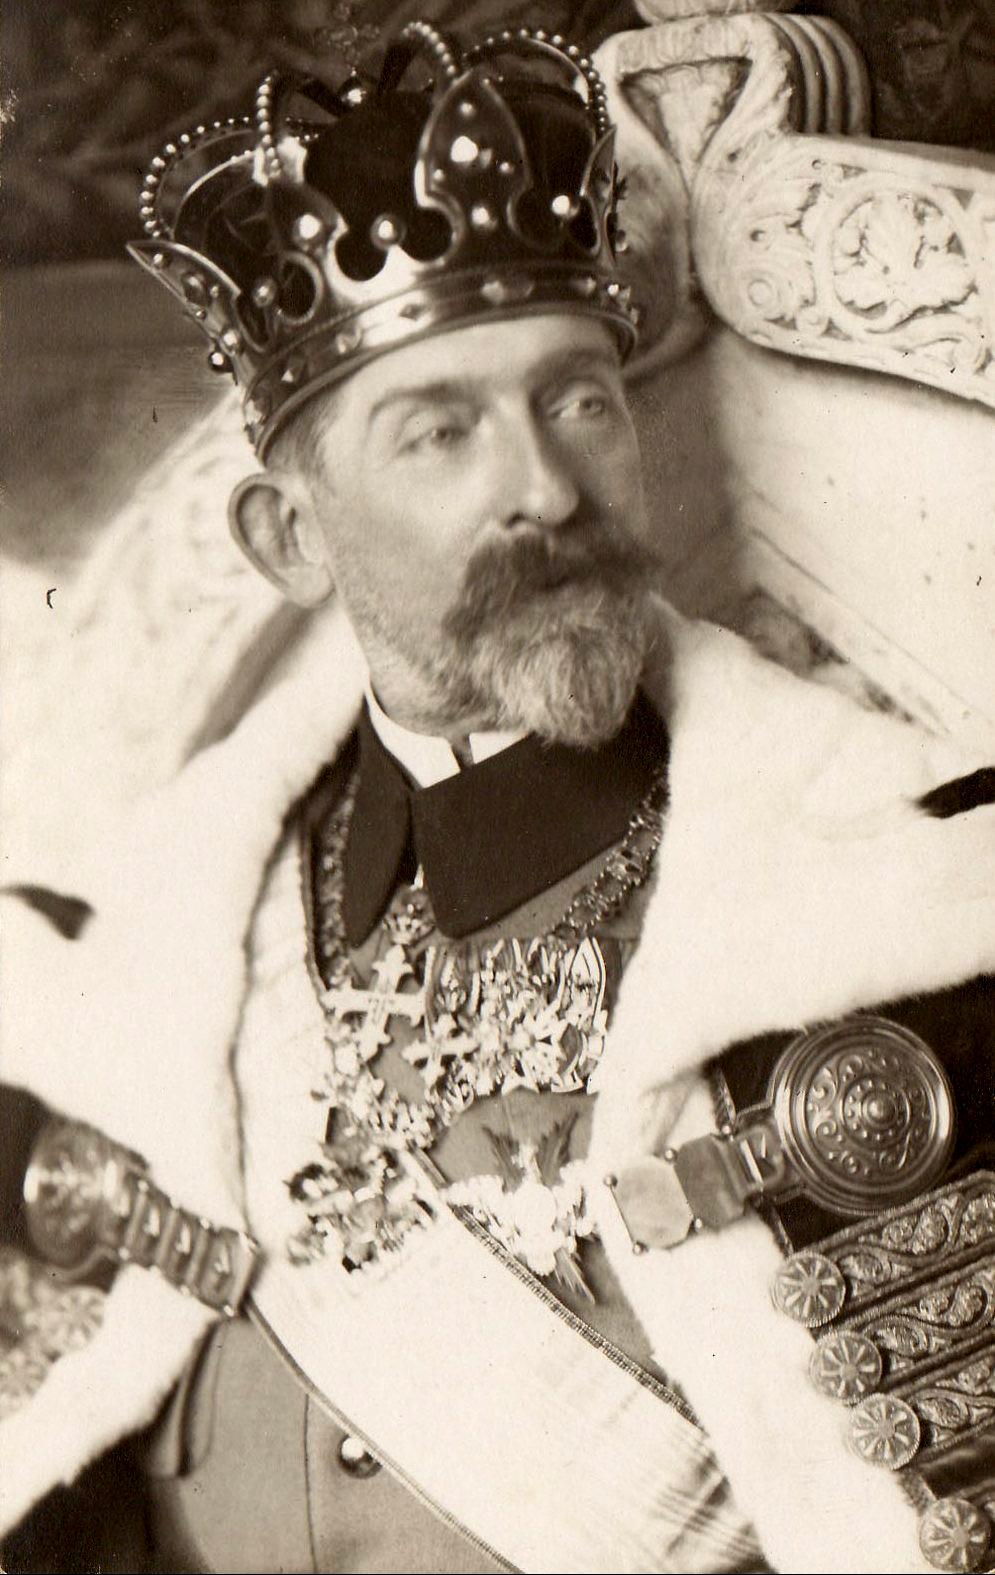 Regele Ferdinand cu Coroana de Otel. 1922 y. | Mažosios Lietuvos istorijos muziejaus nuotr.